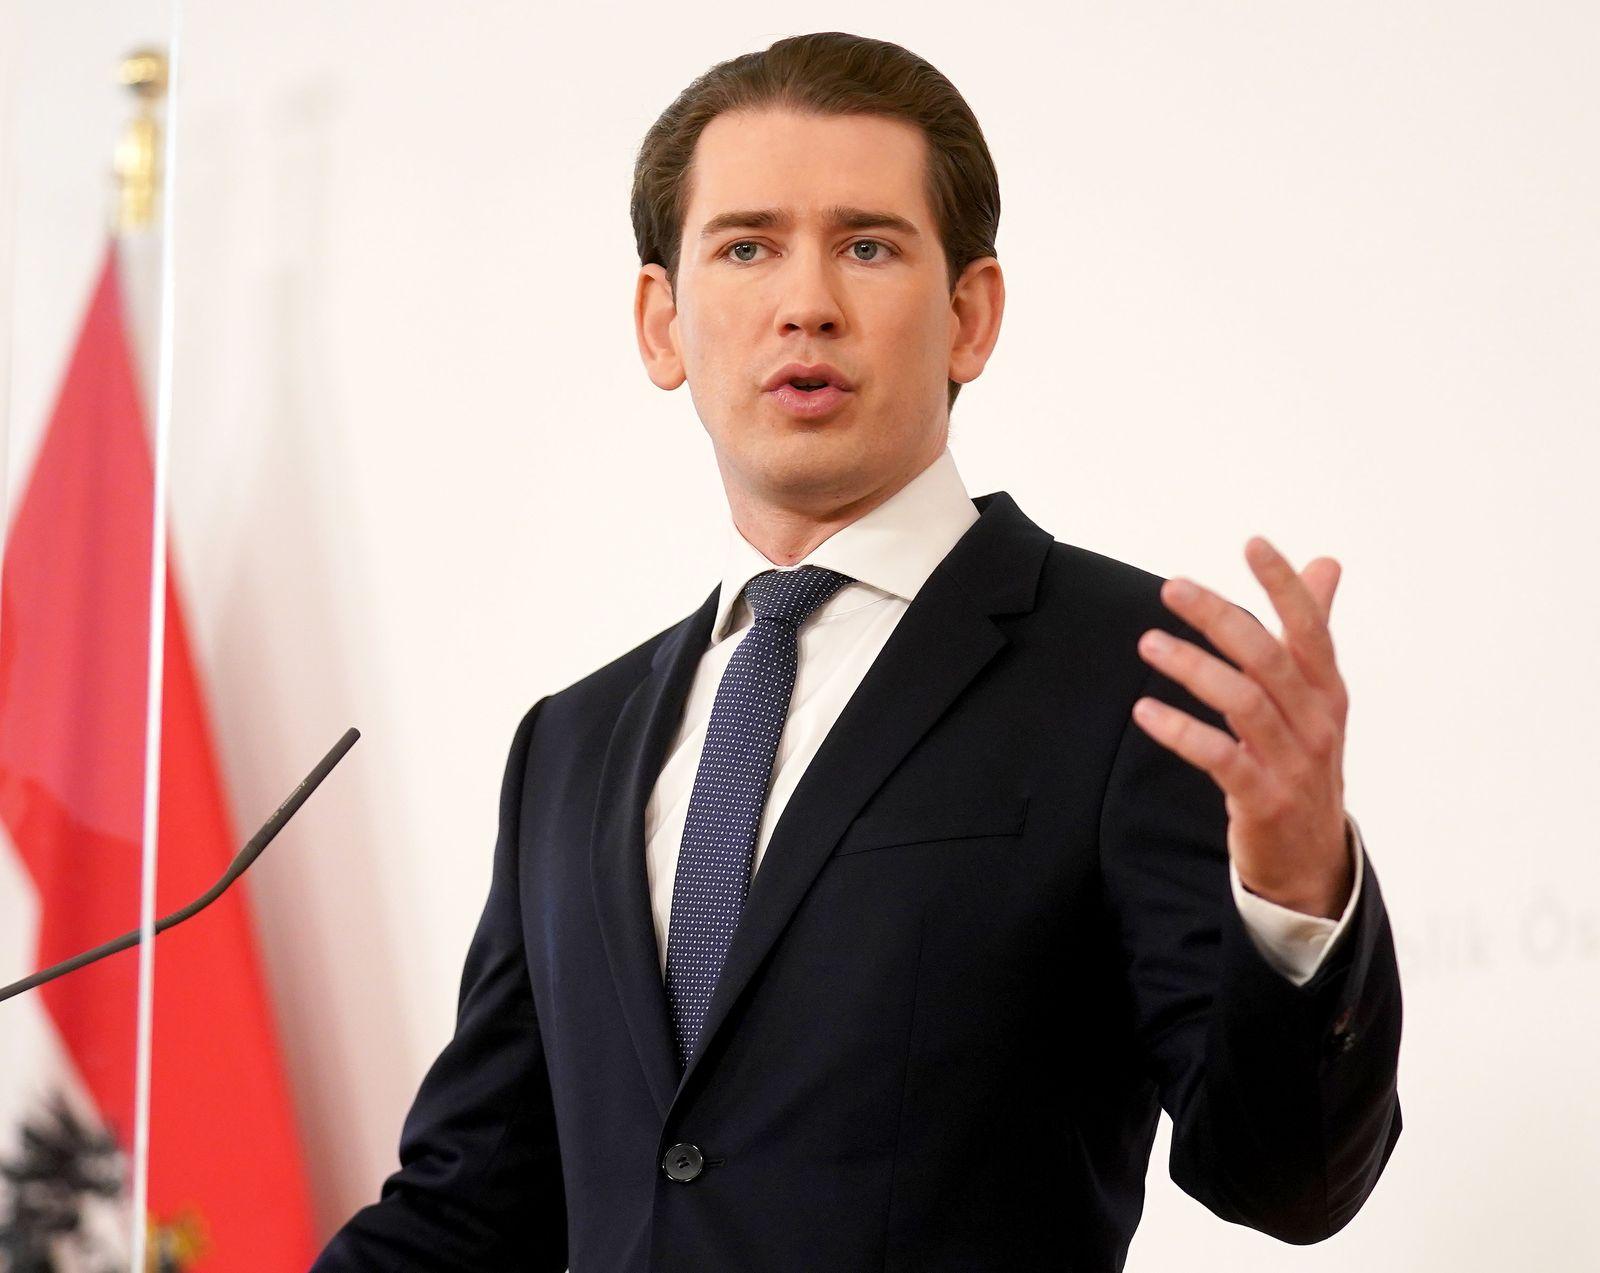 CORONA: PRESSEFOYER NACH DEM MINISTERRAT · KURZ